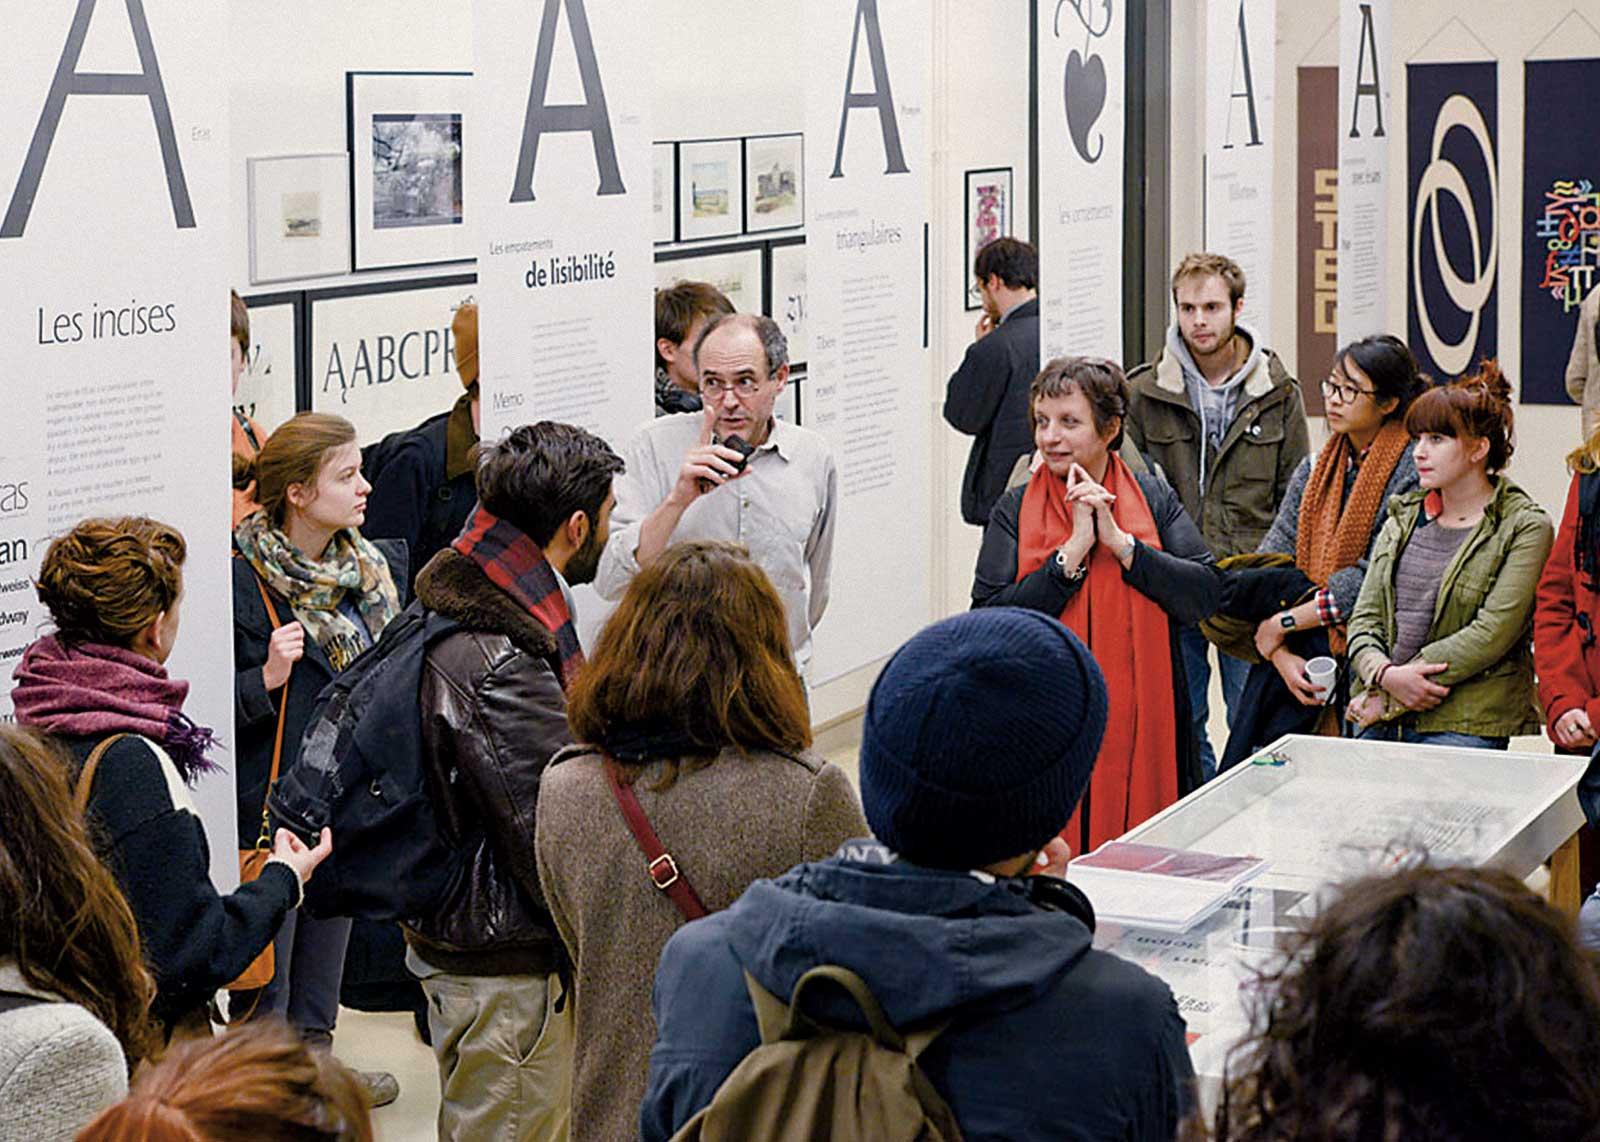 Albert Boton, vernissage exposition — Barbara Dennys et Olivier Nineuil présentent l'exposition (photo Mike Sabbagh).